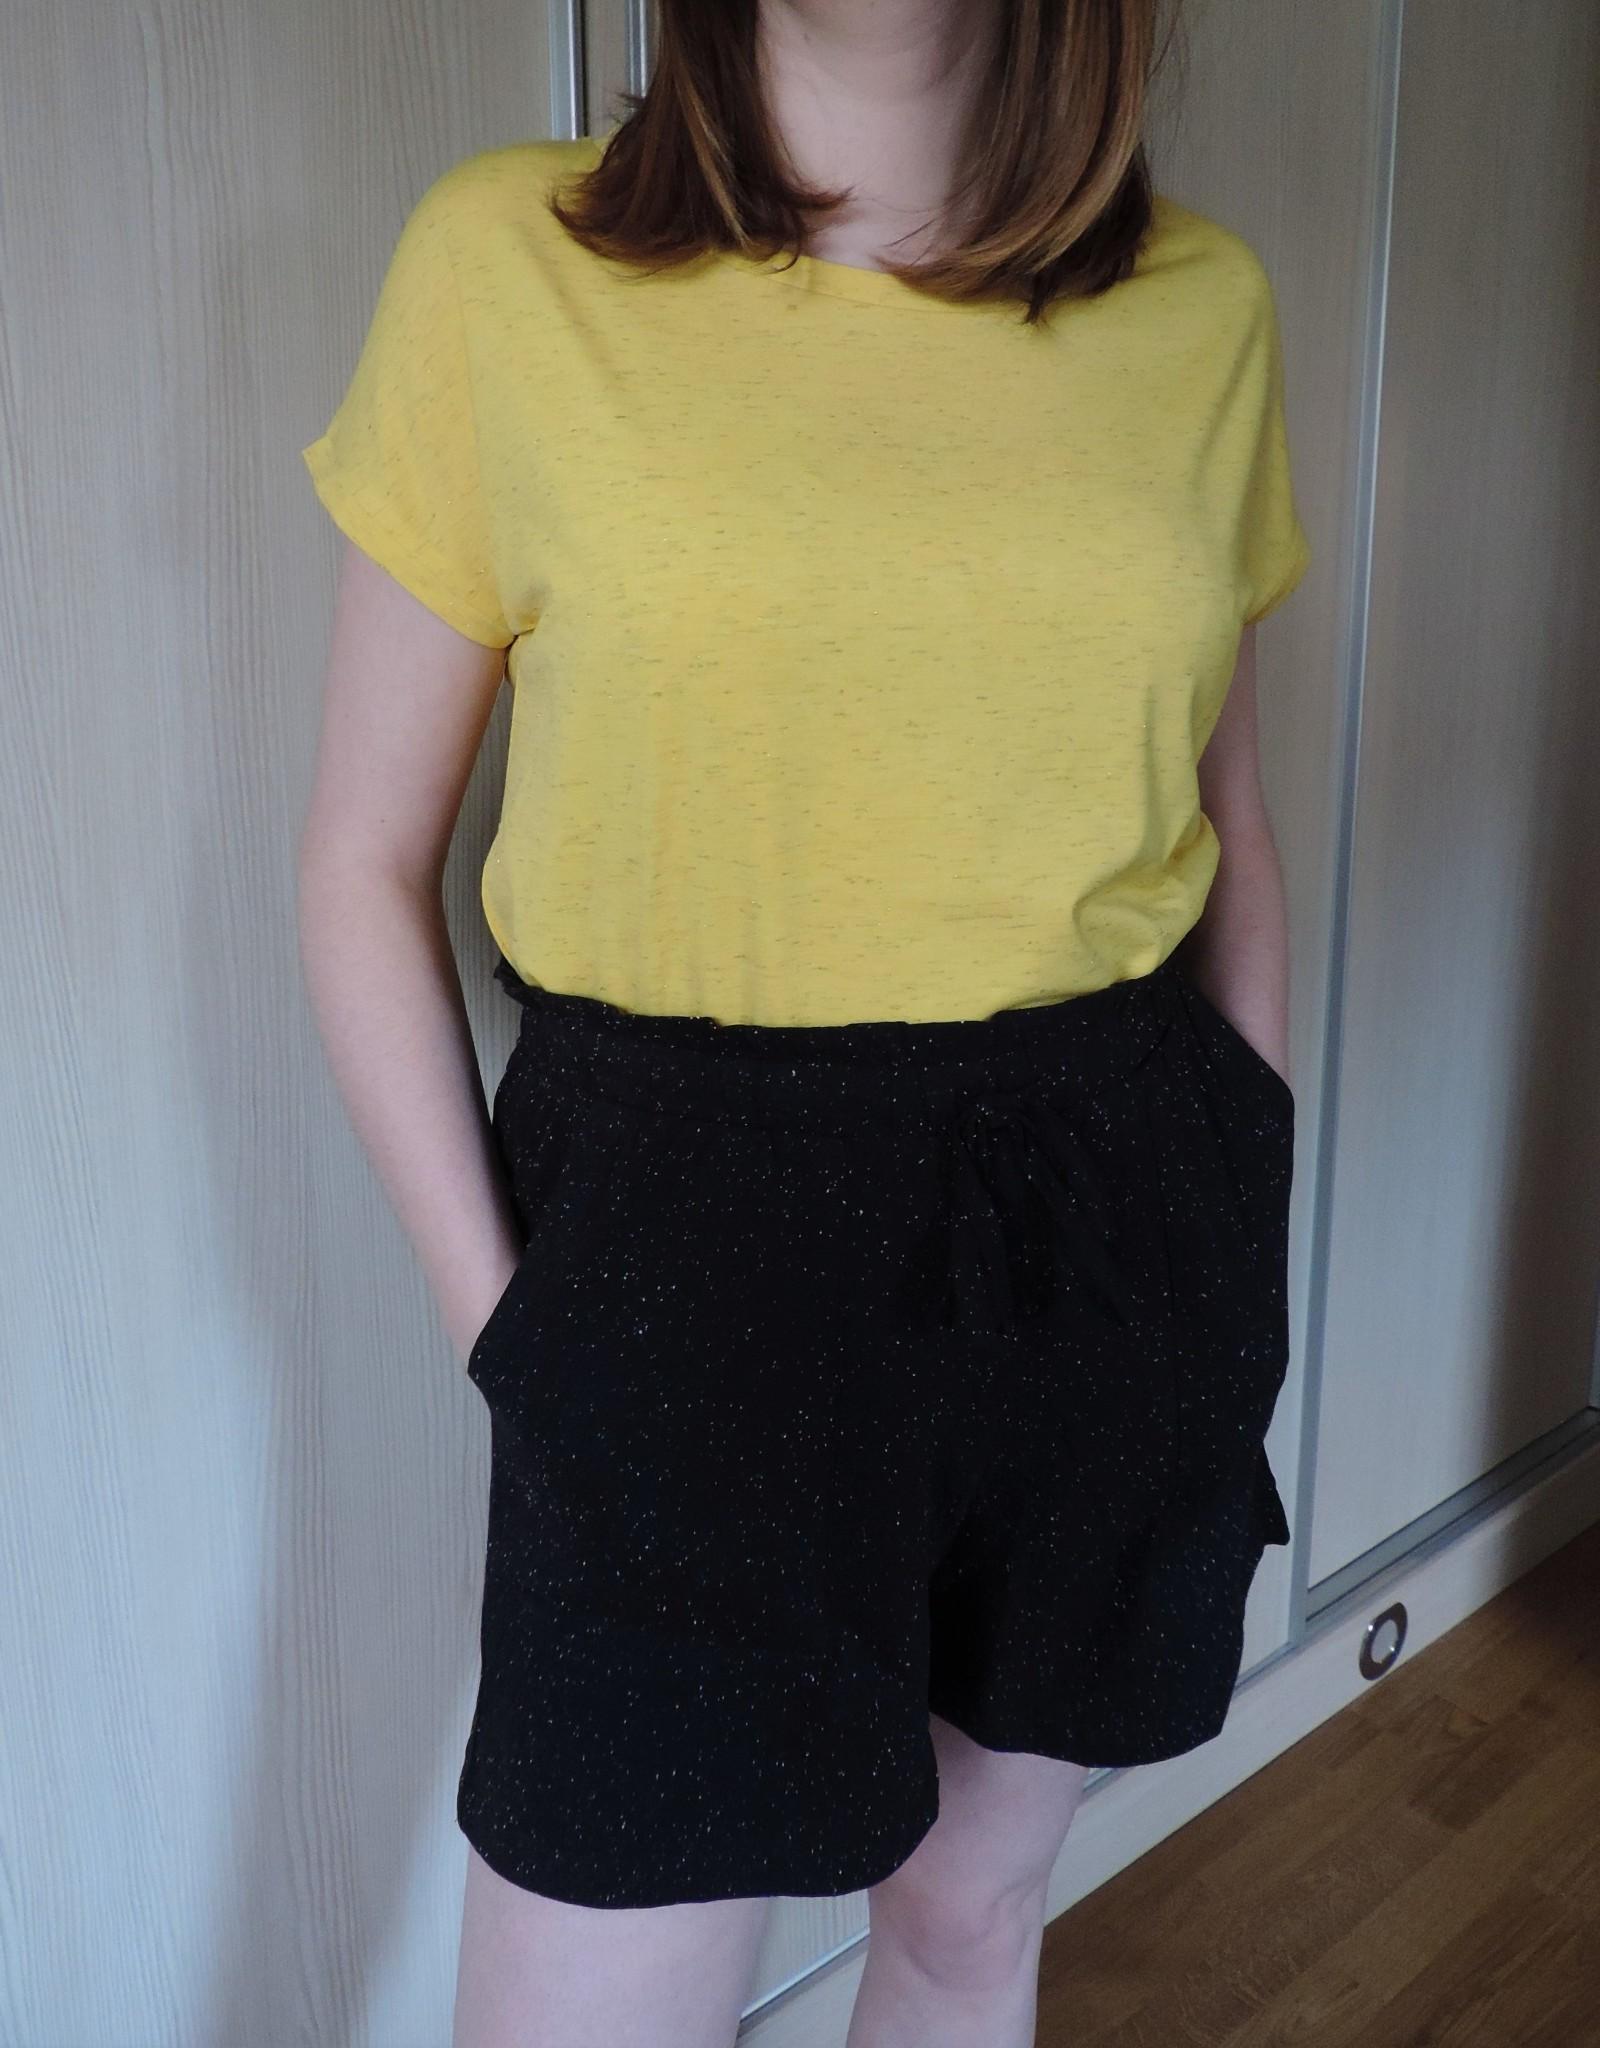 Rebelle T-shirt yellow